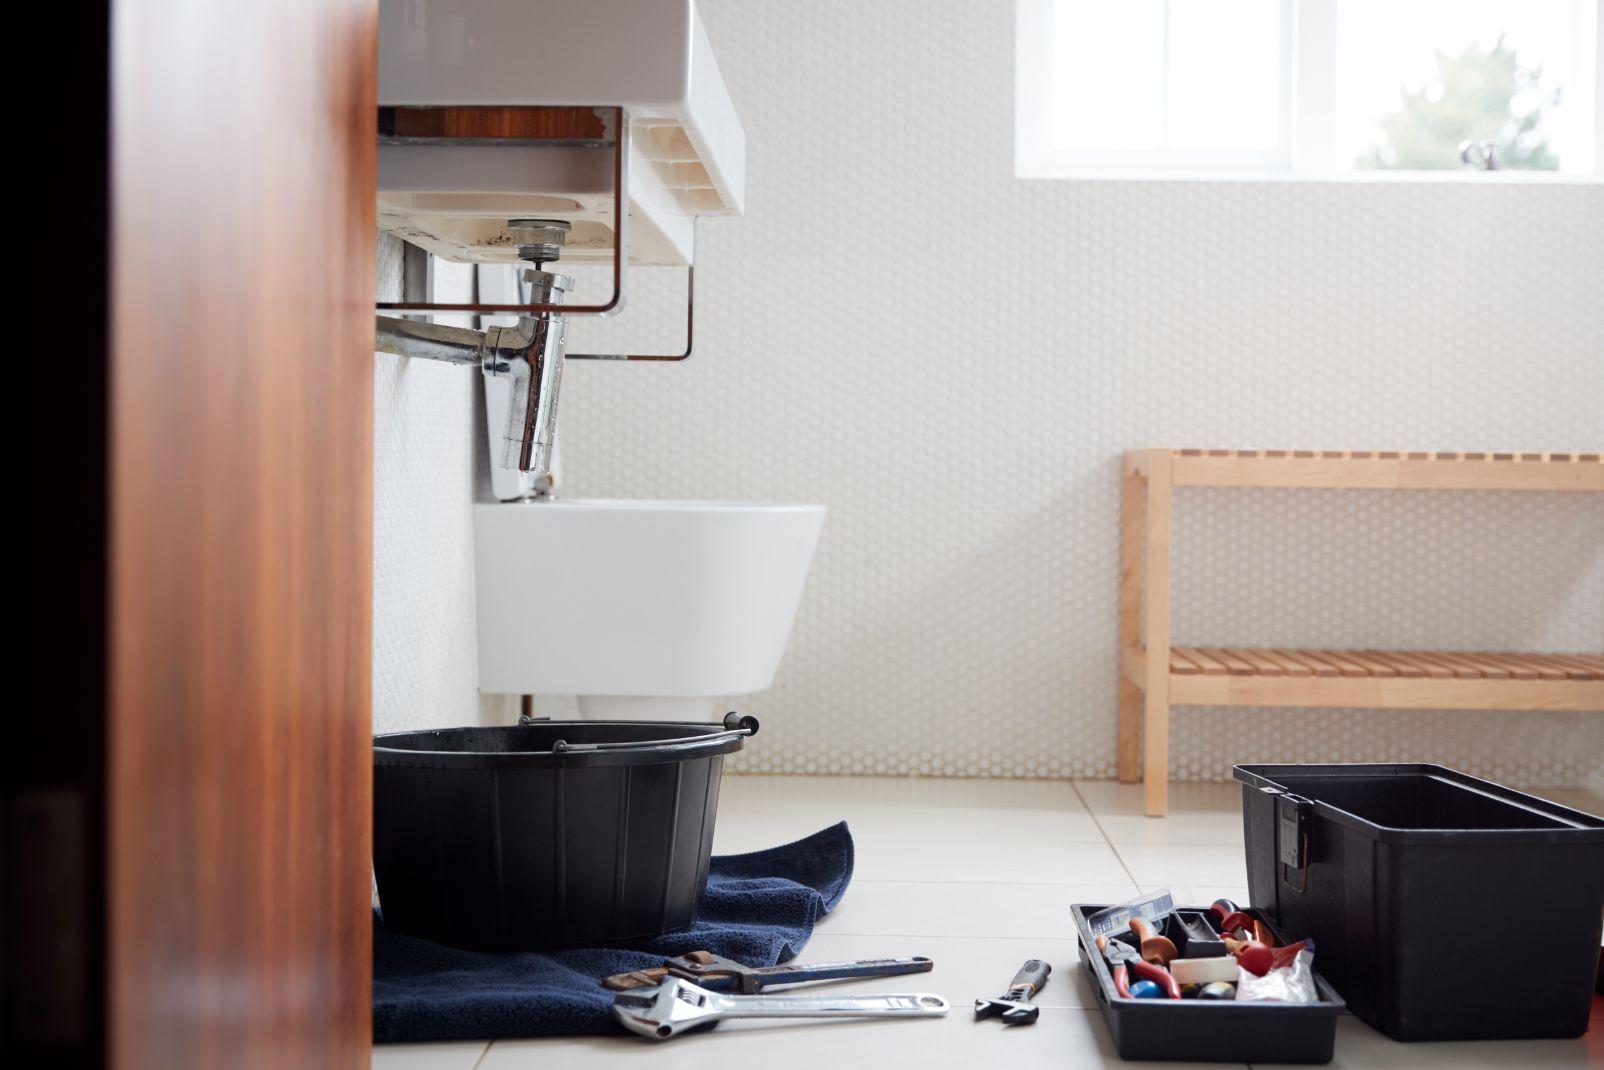 plumbing tools in bathroom ready to repair leaking QXZCX